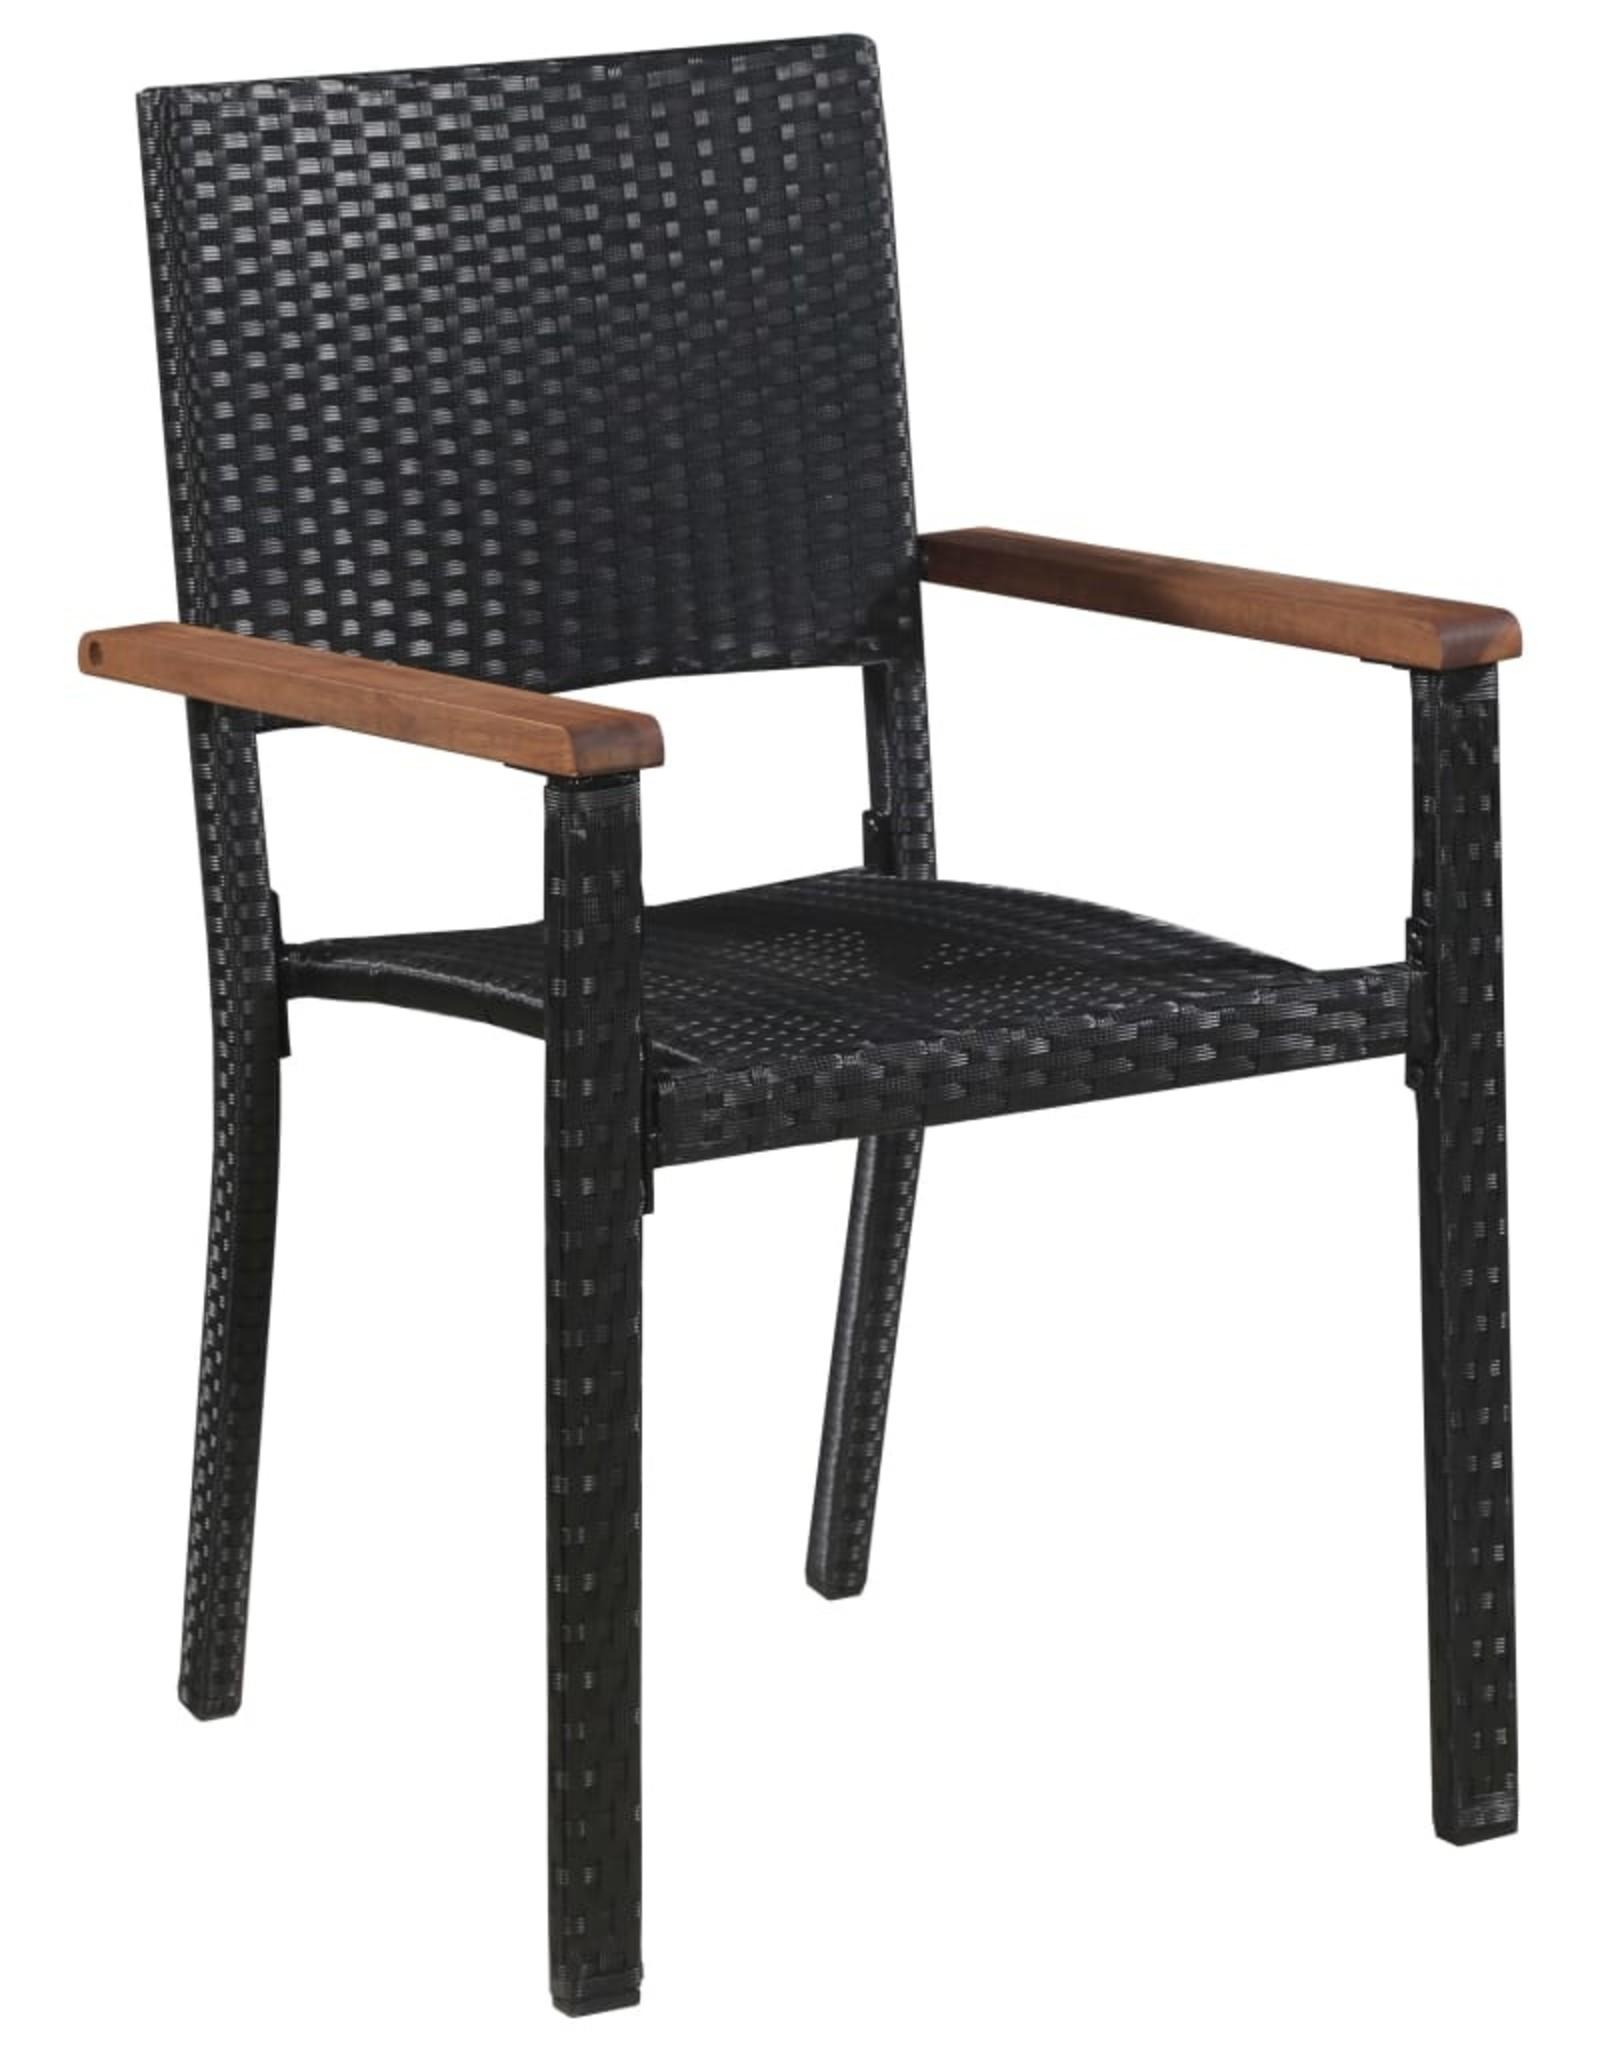 3-delige Tuinset zwart